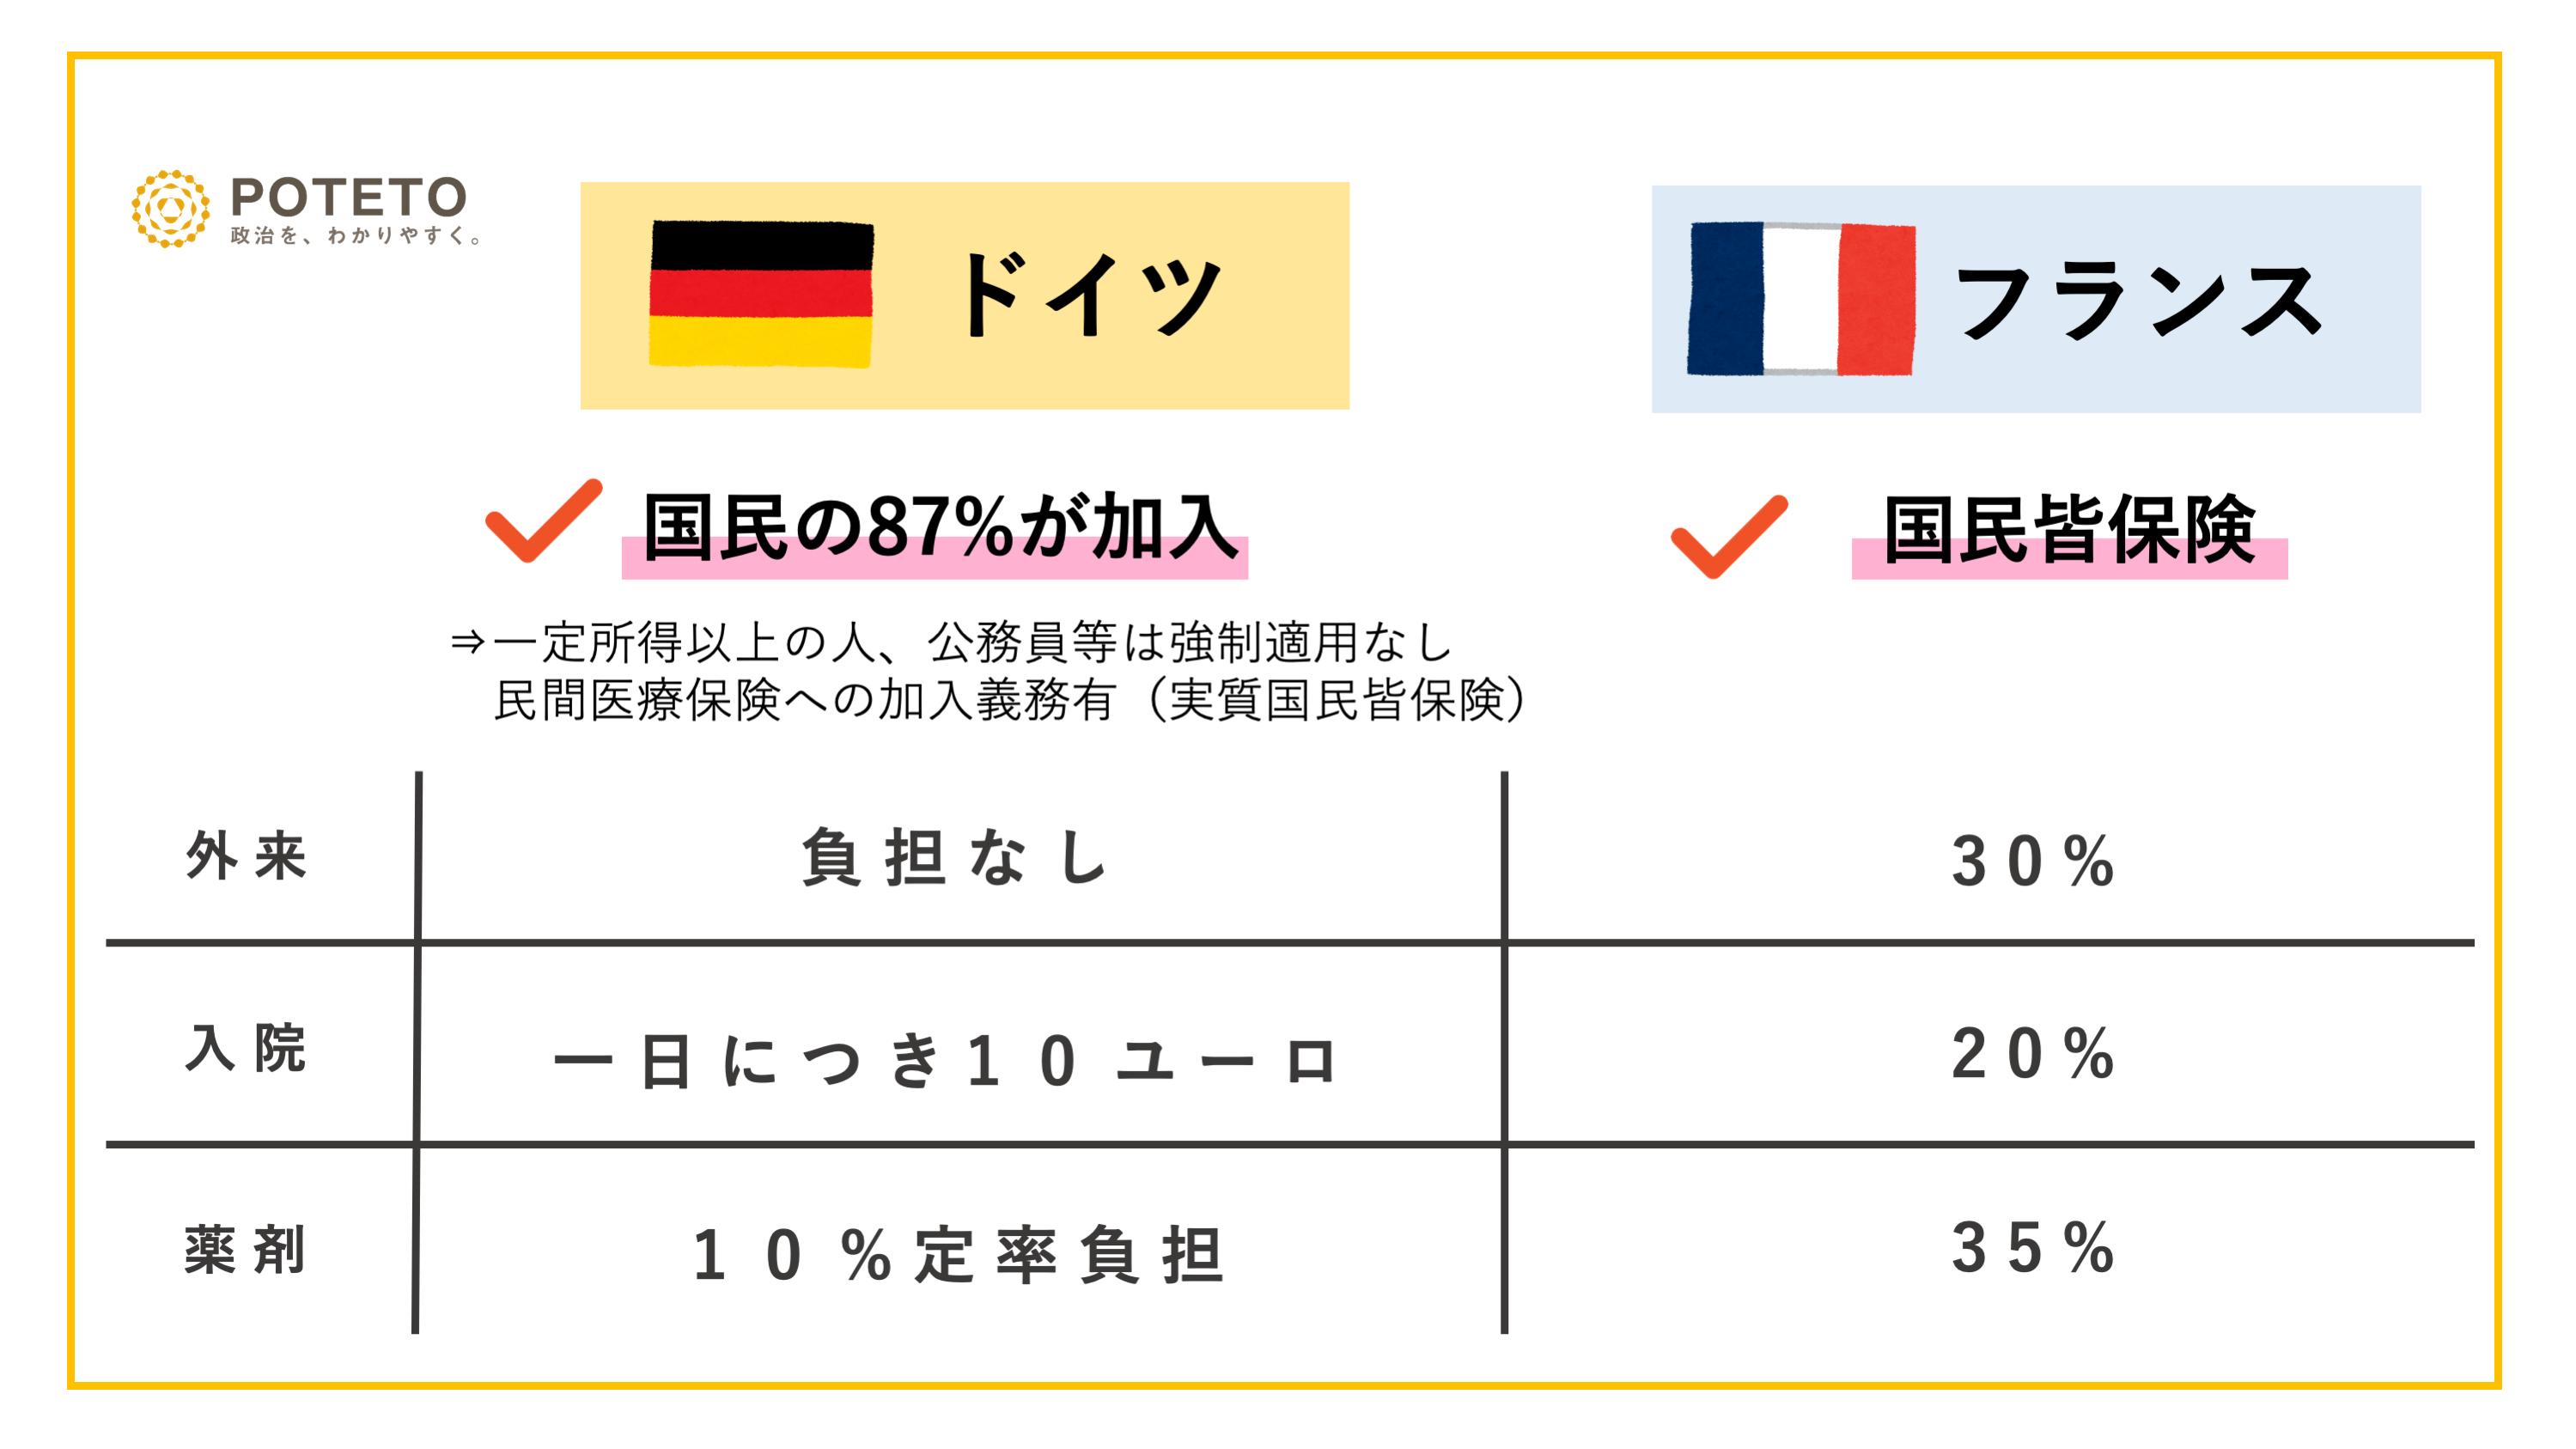 a61c901a422d10759e0af5d1465ba02b 3 - 日本の社会保障制度【POTETOリサーチ】